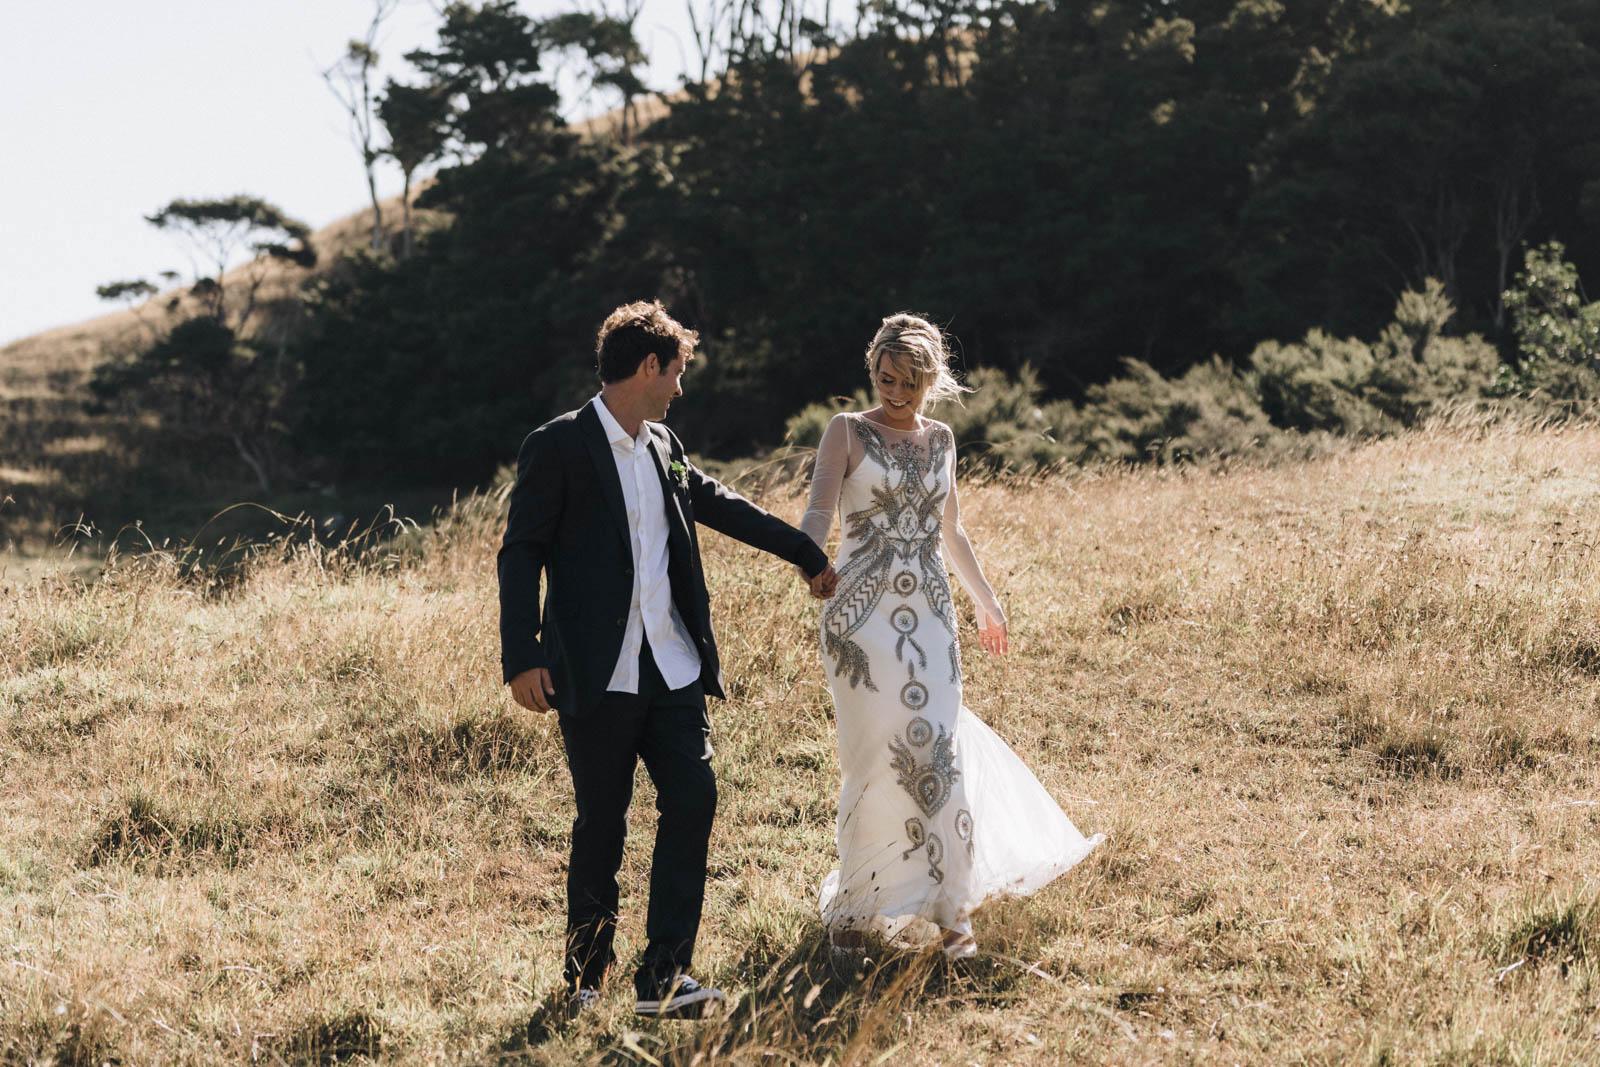 newfound-l-i-coromandel-wedding-photographer-1735-A9_03889-1